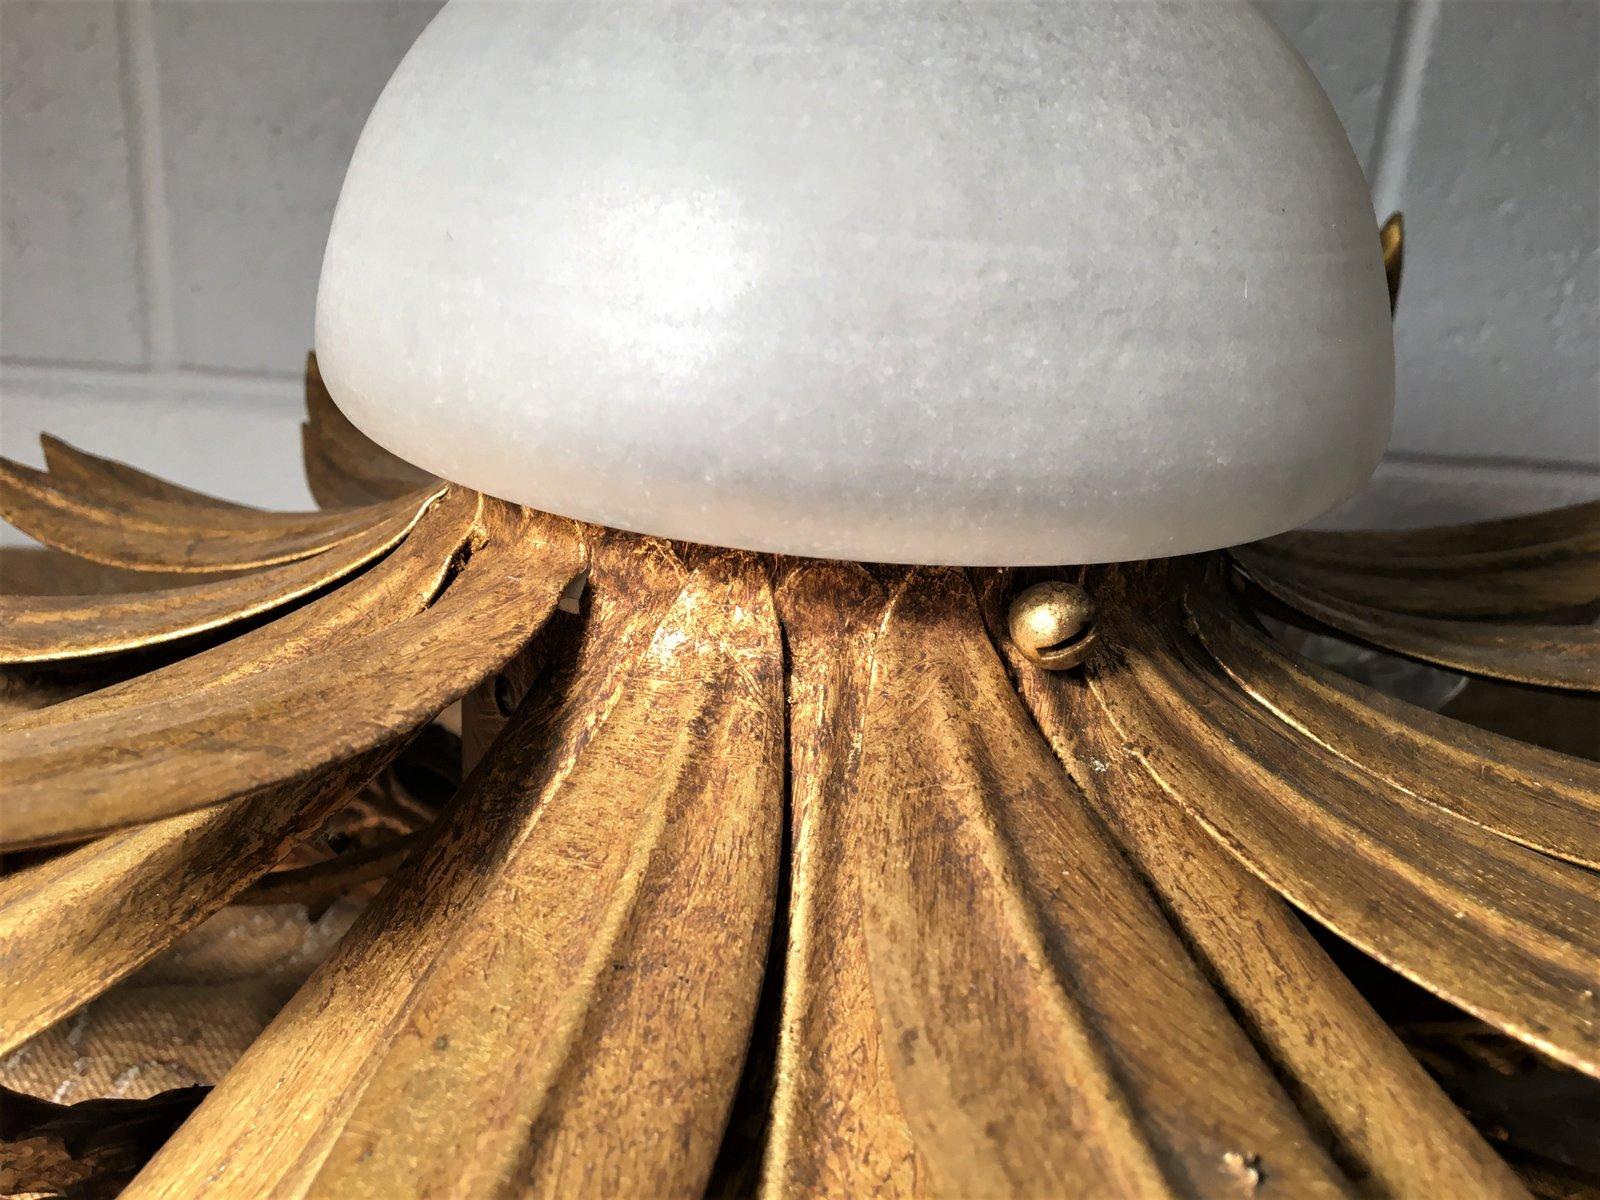 plafonnier en fer dor verre 1960s en vente sur pamono. Black Bedroom Furniture Sets. Home Design Ideas